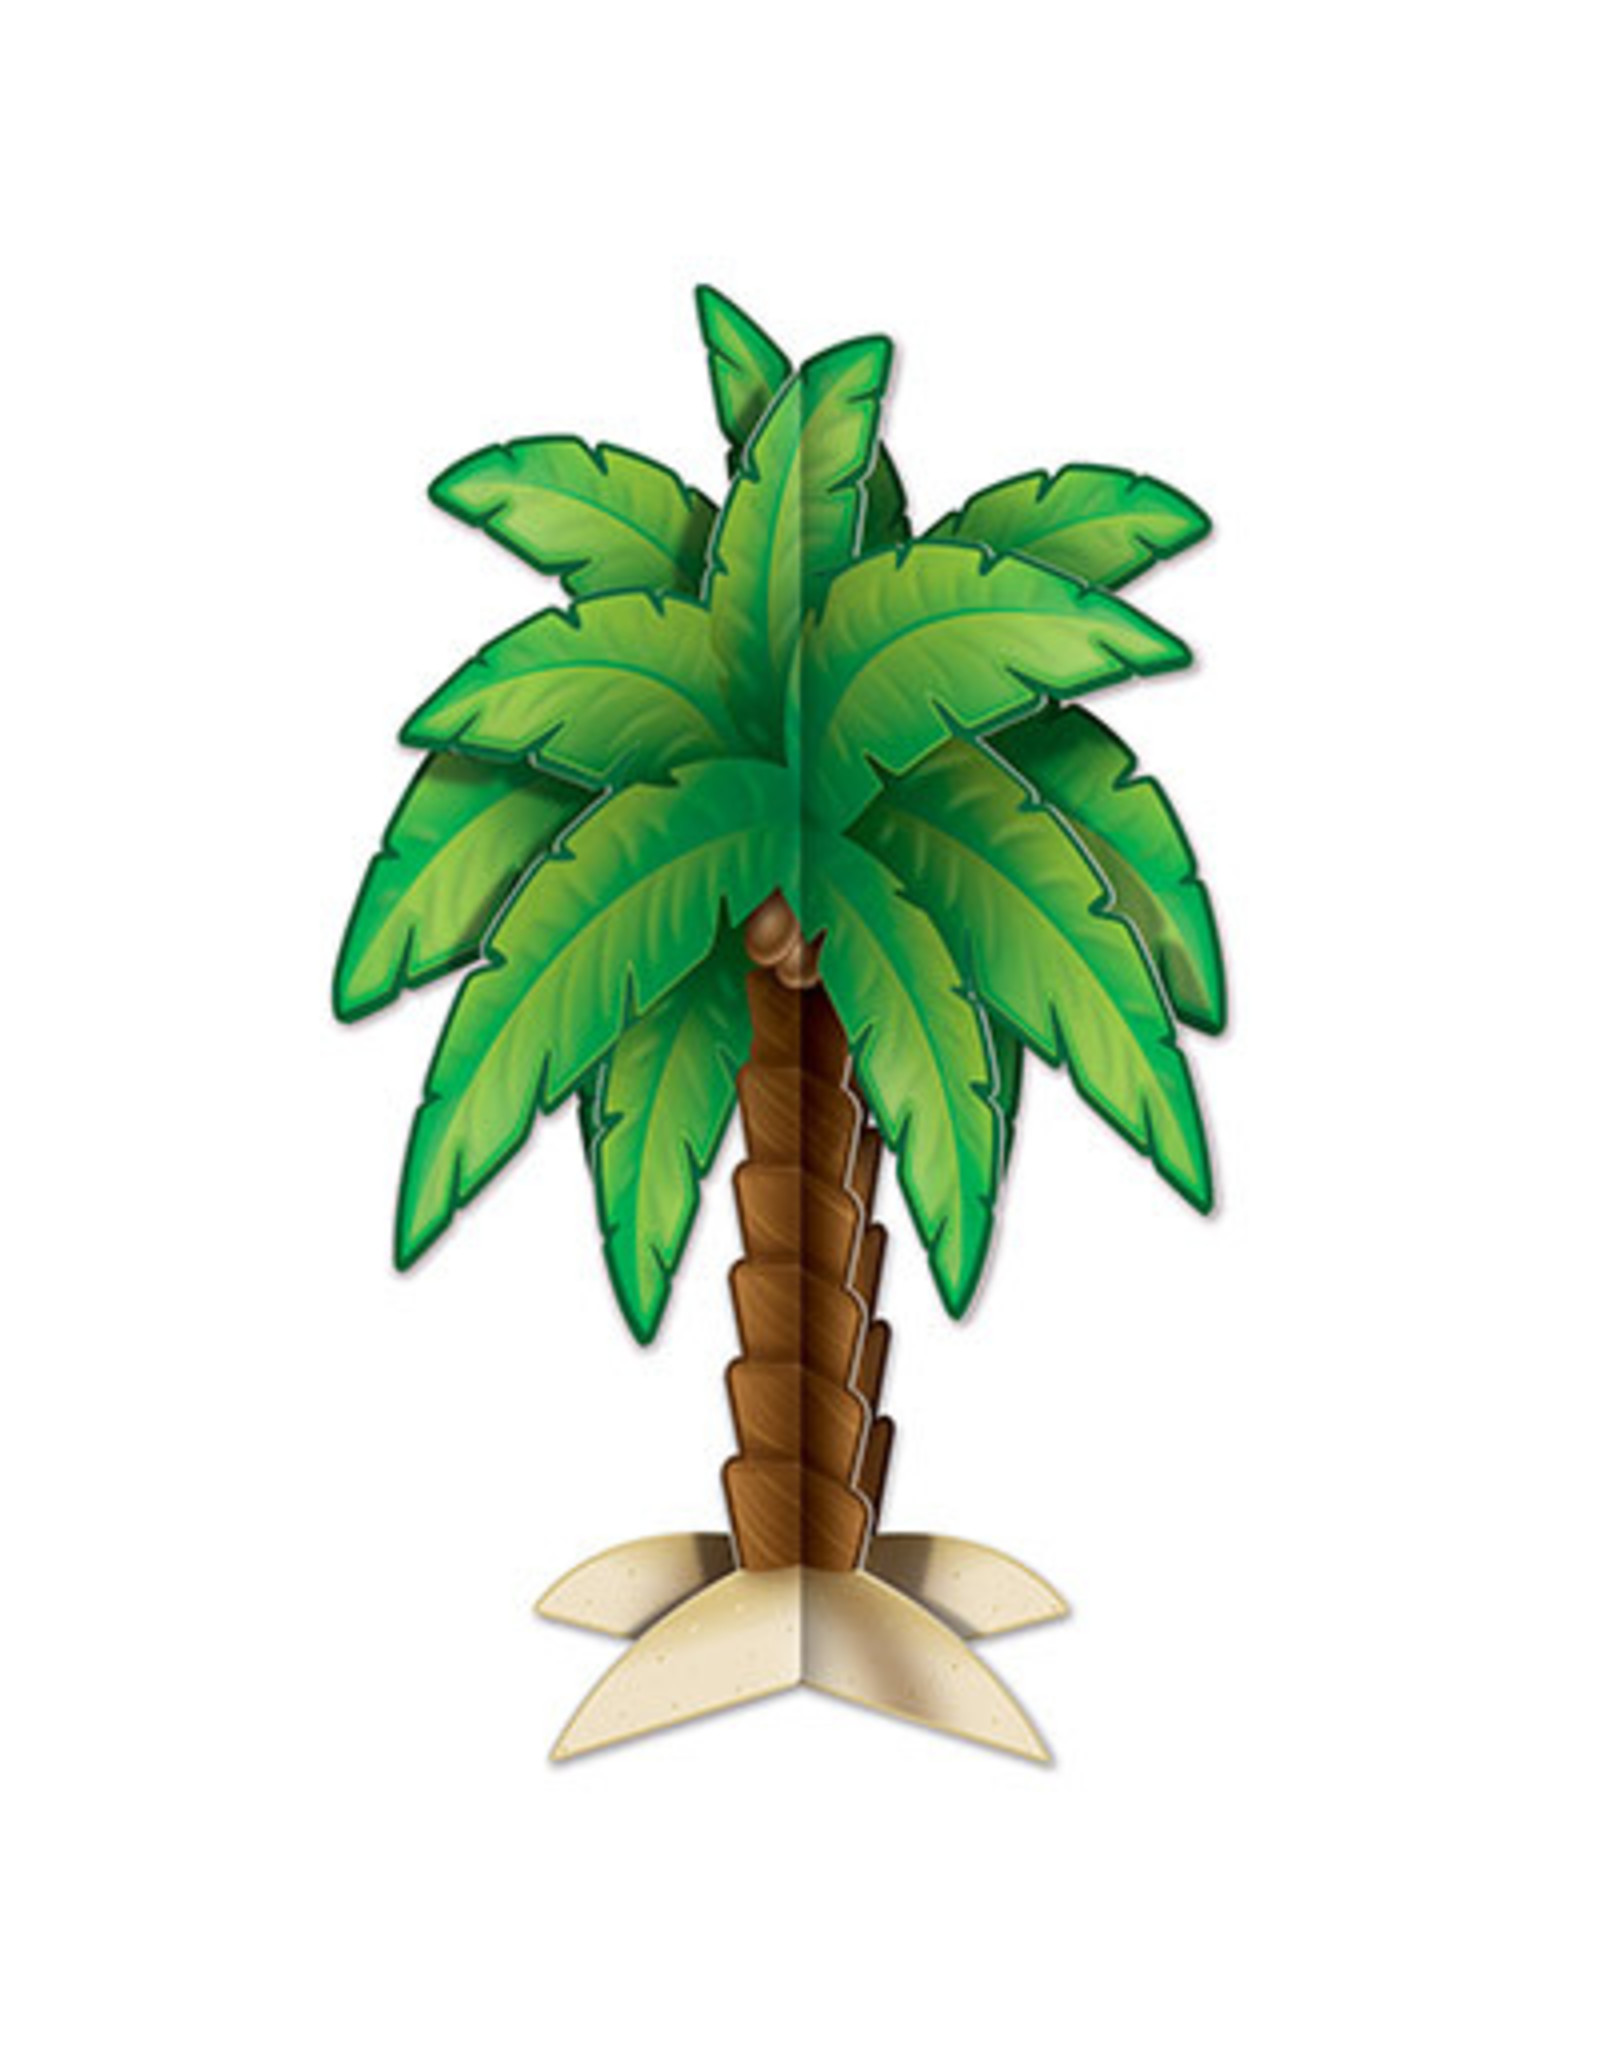 "Beistle 11.75"" 3-D Palm Tree Centerpiece - 1ct."